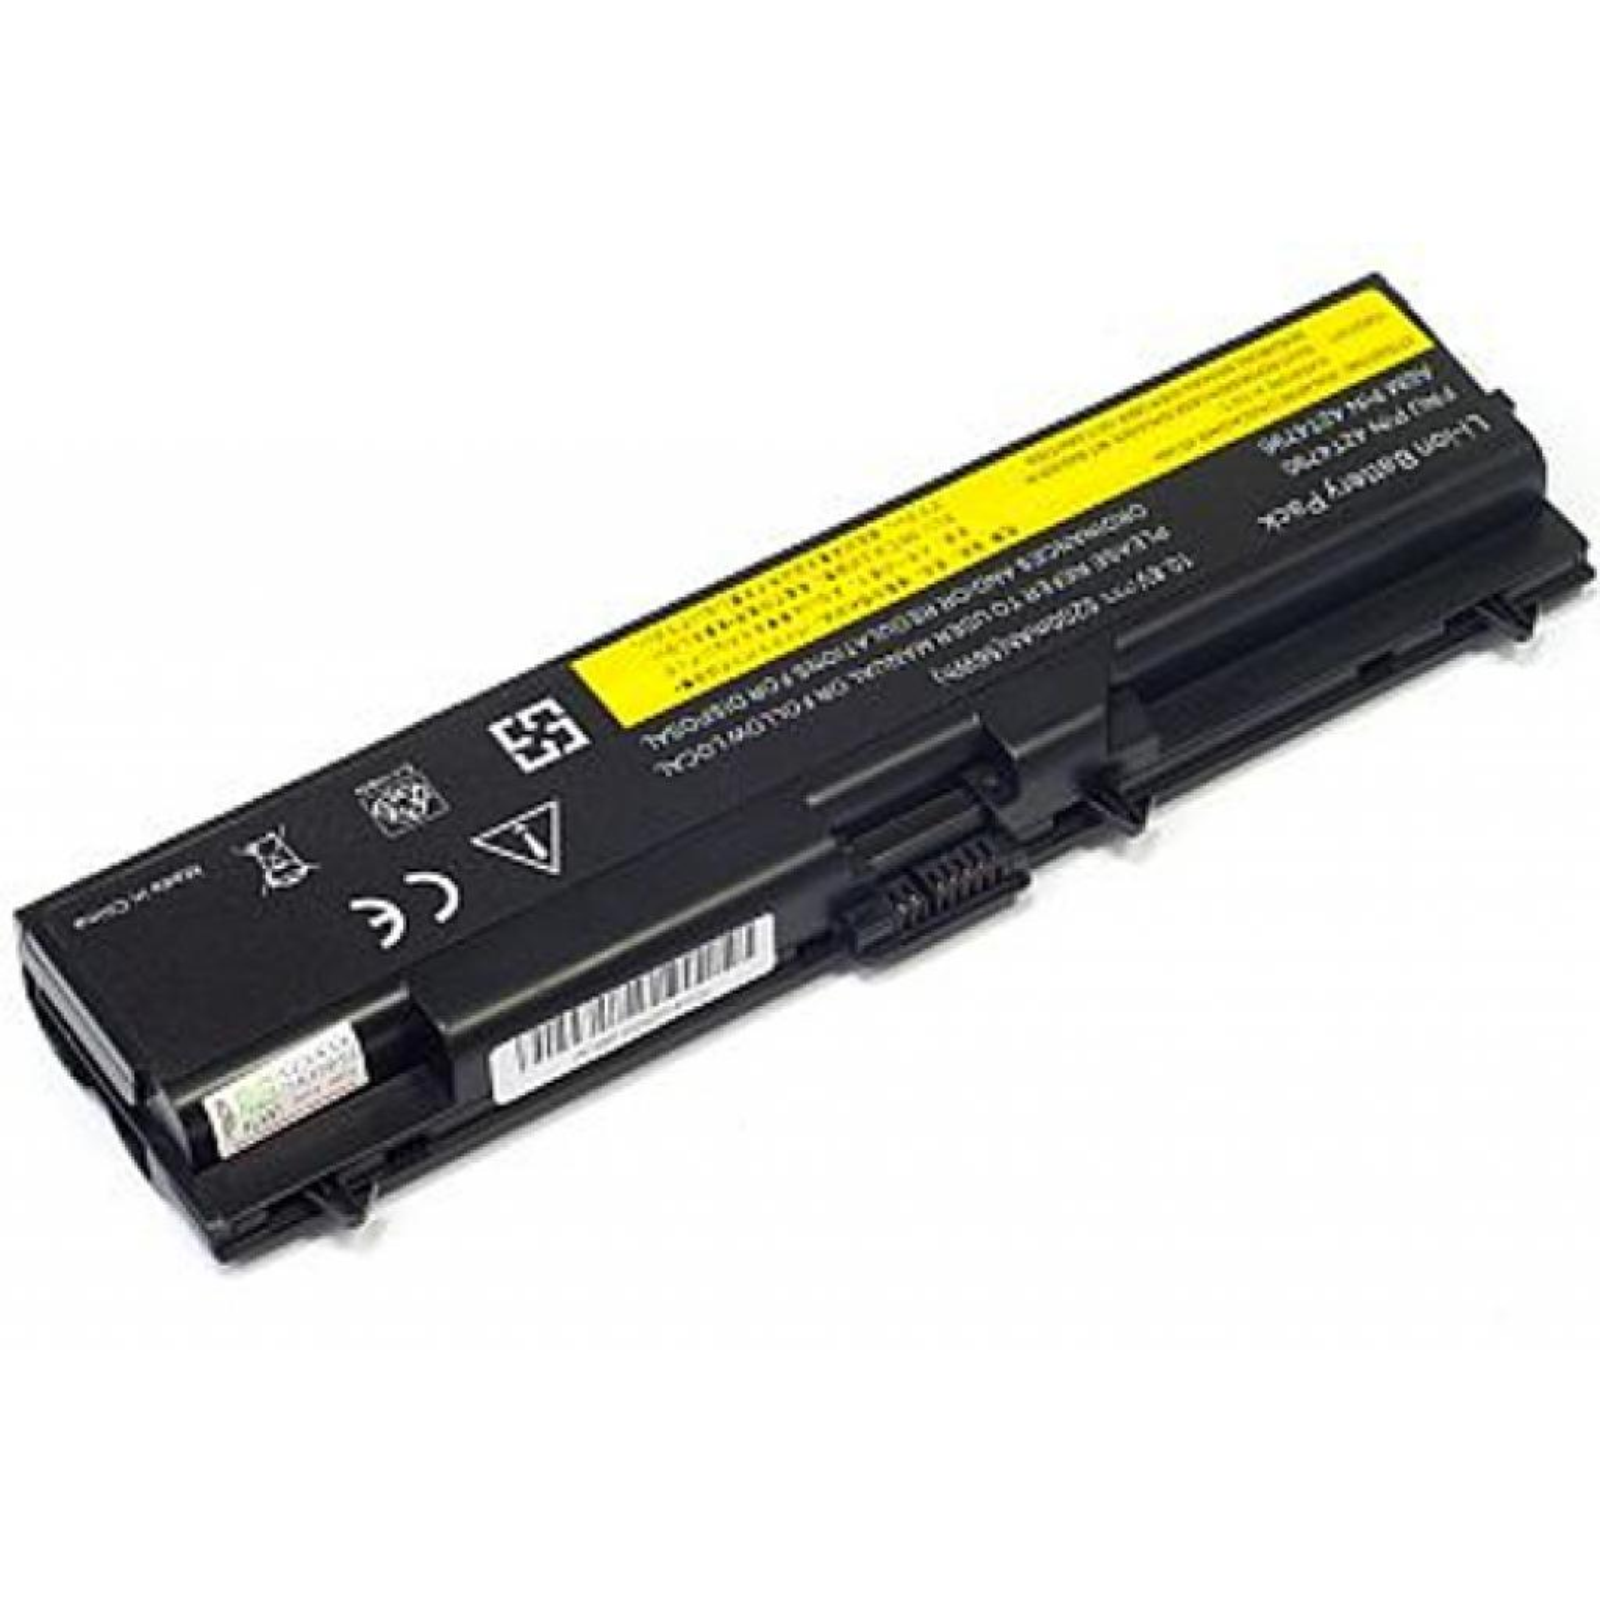 Аккумулятор для ноутбука LENOVO ThinkPad SL410K (FRU42T4795, IMSL40LH) 10.8V 5200mAh PowerPlant (NB00000069)